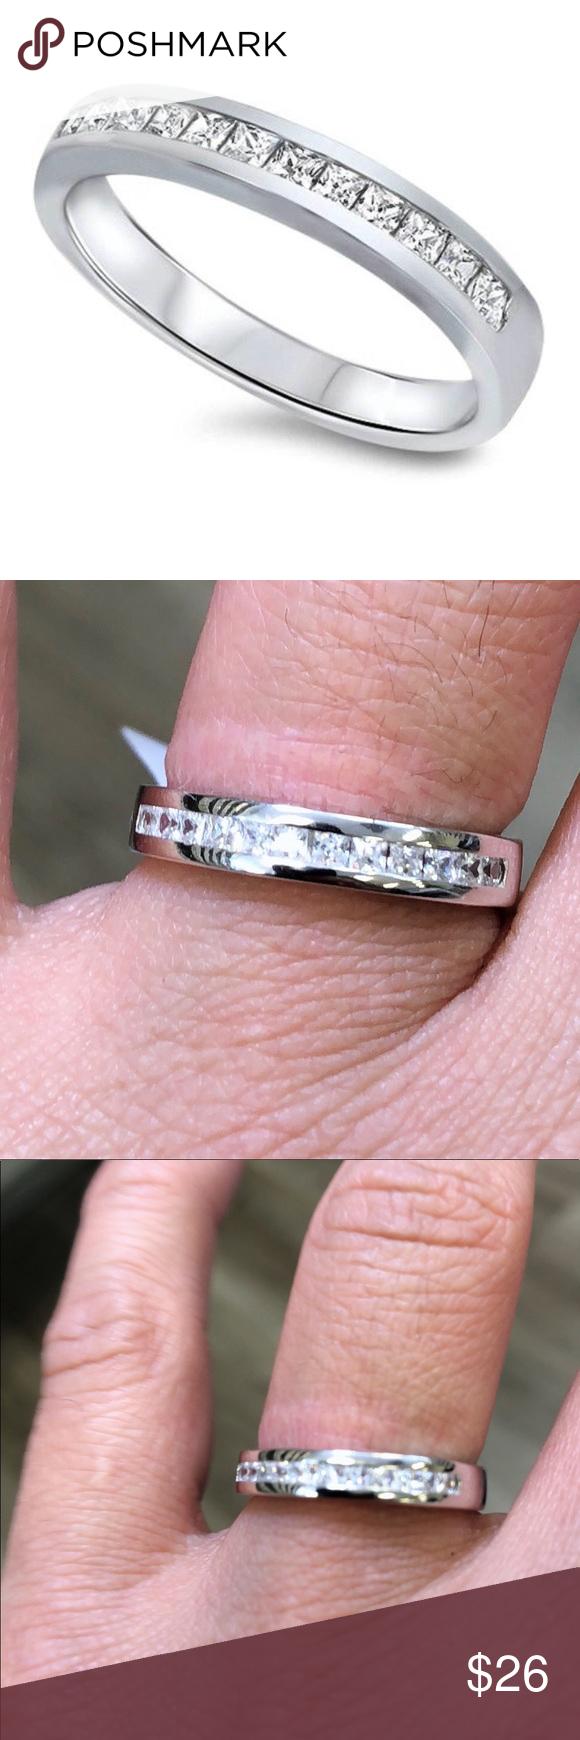 Pin On Vintage Wedding Ring Styles